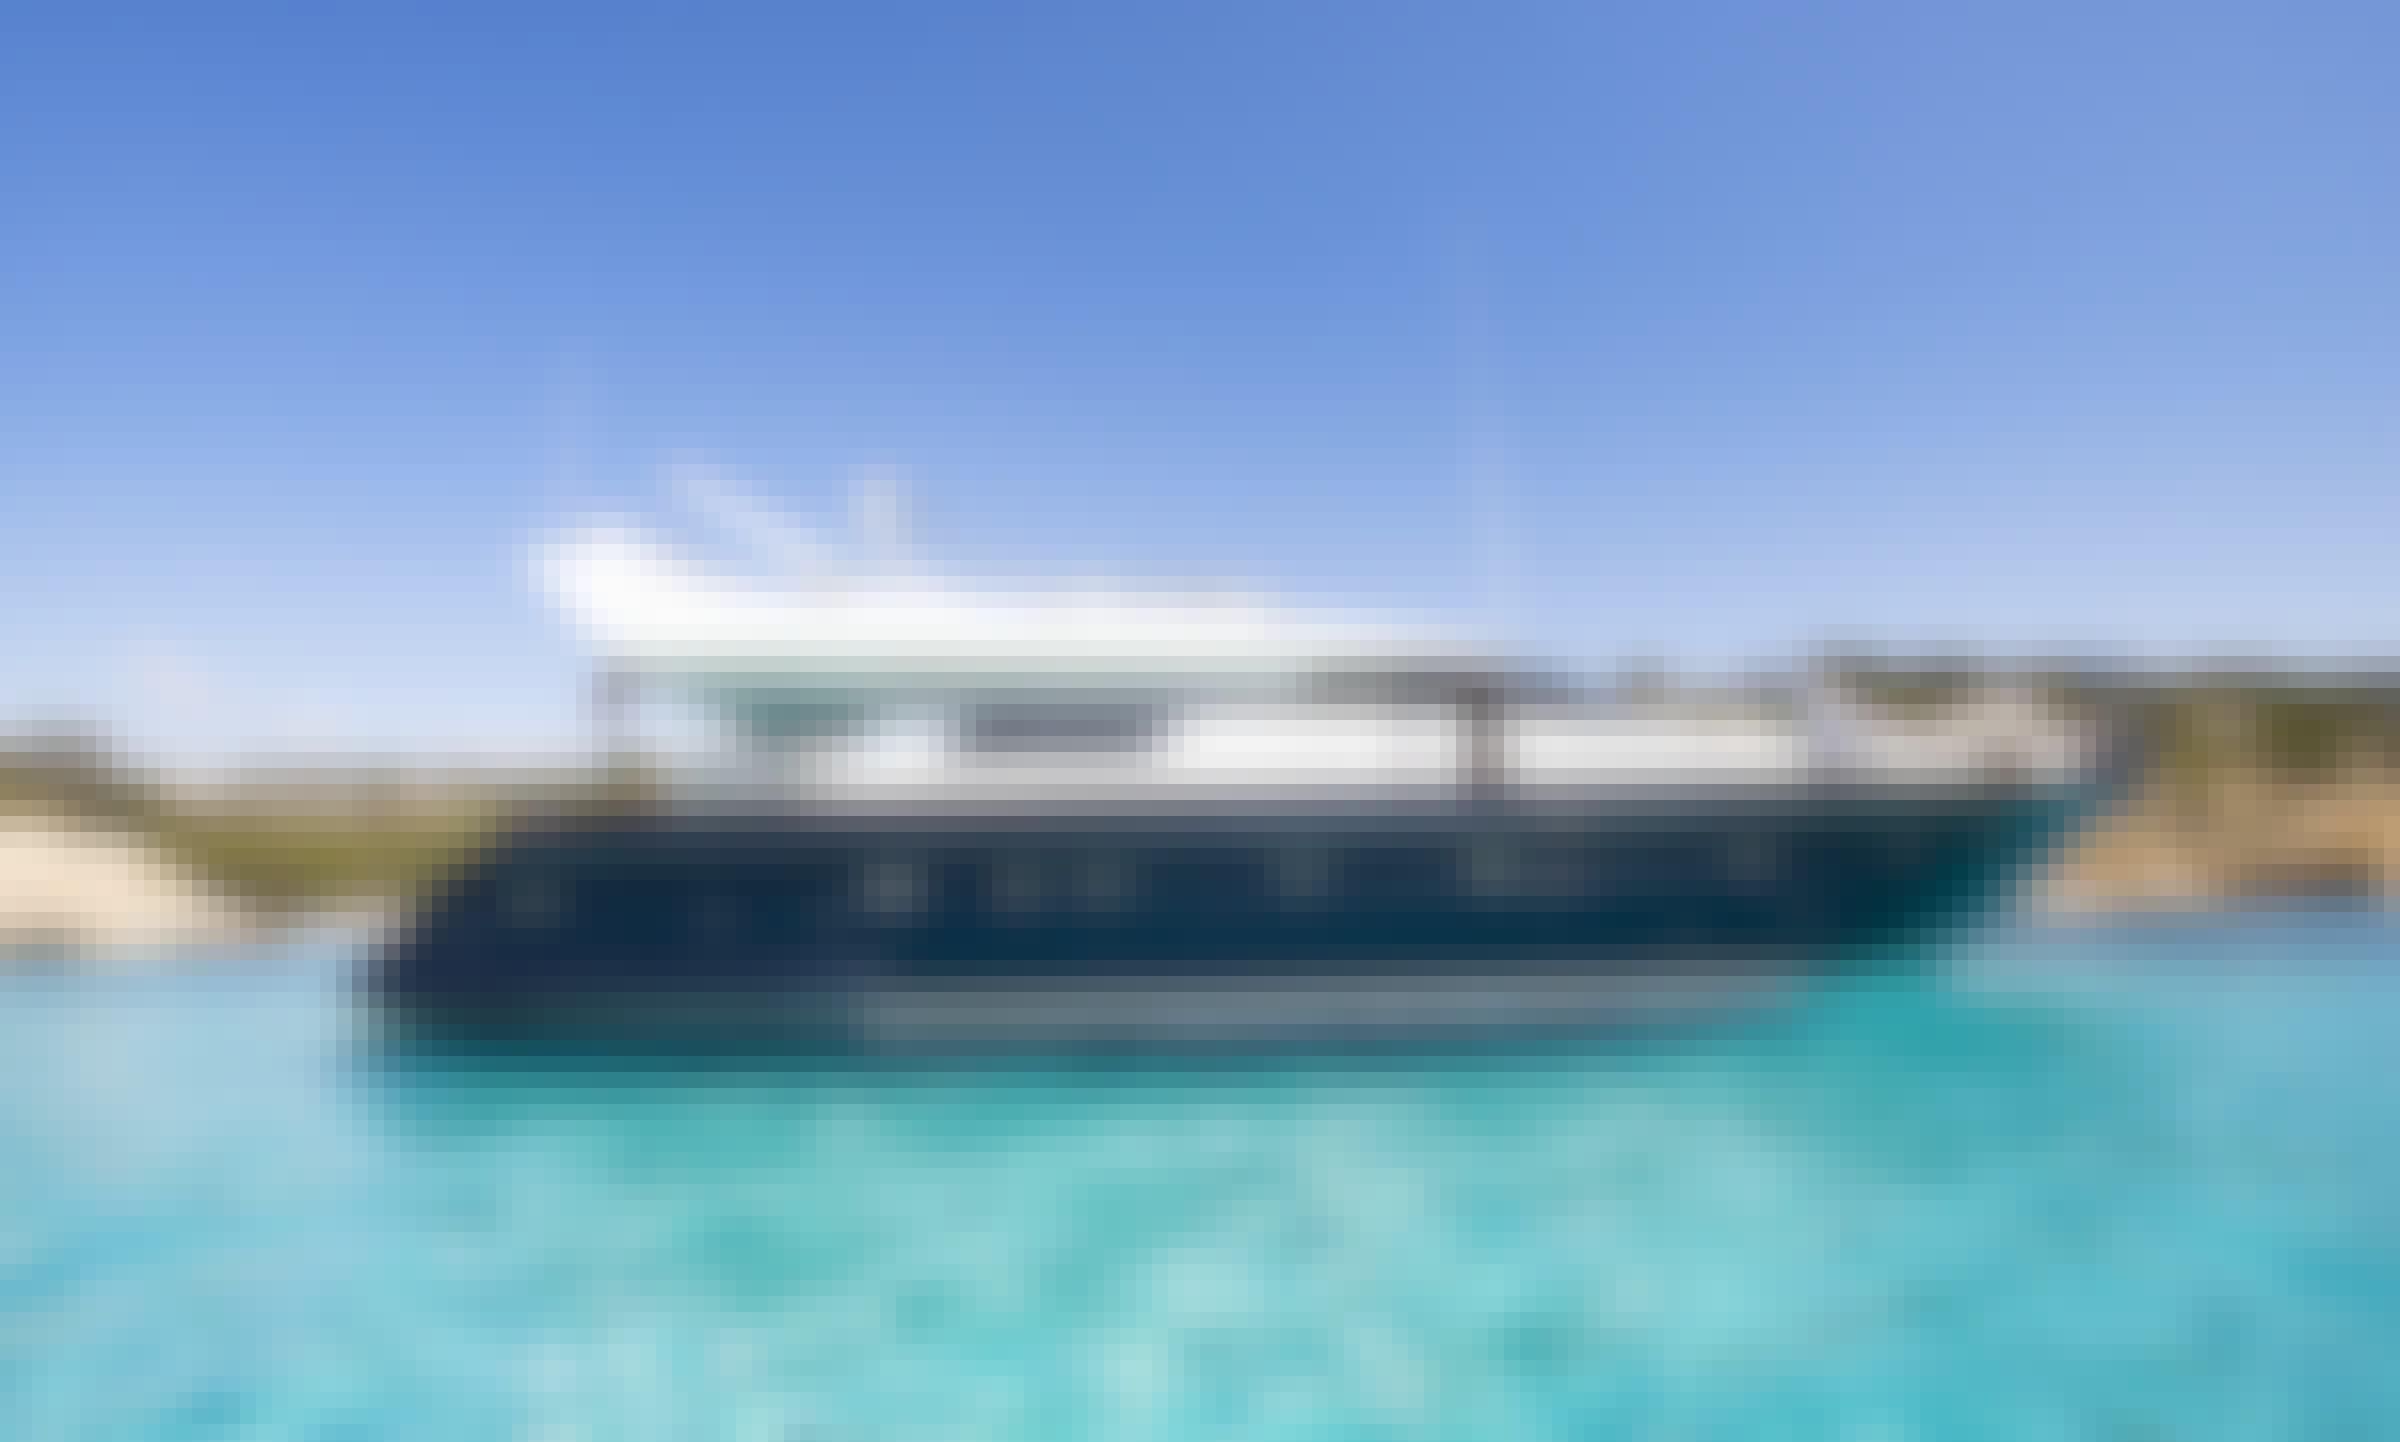 Astondoa 68 Motor Yacht Charter in Palma, Spain